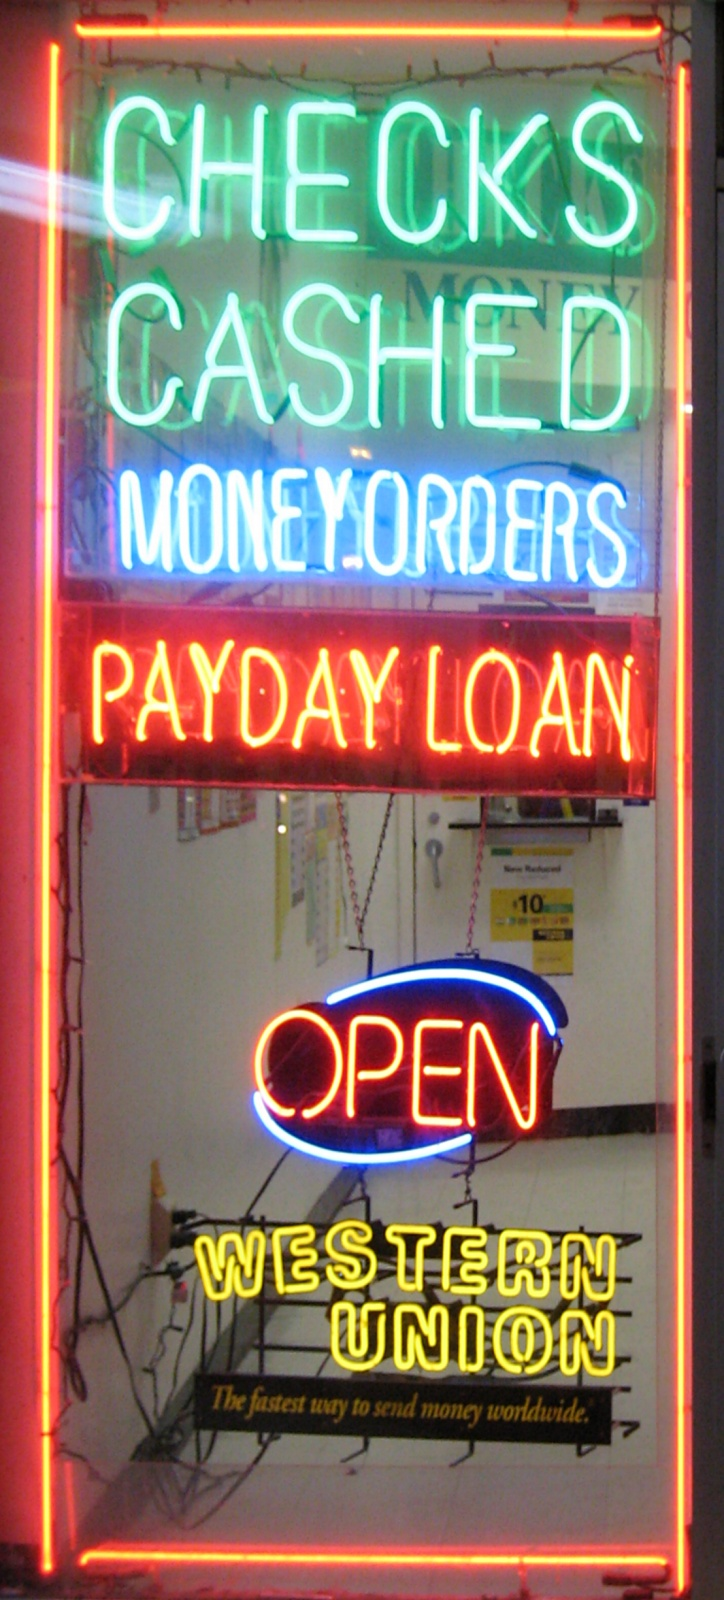 A payday loan company photo 10